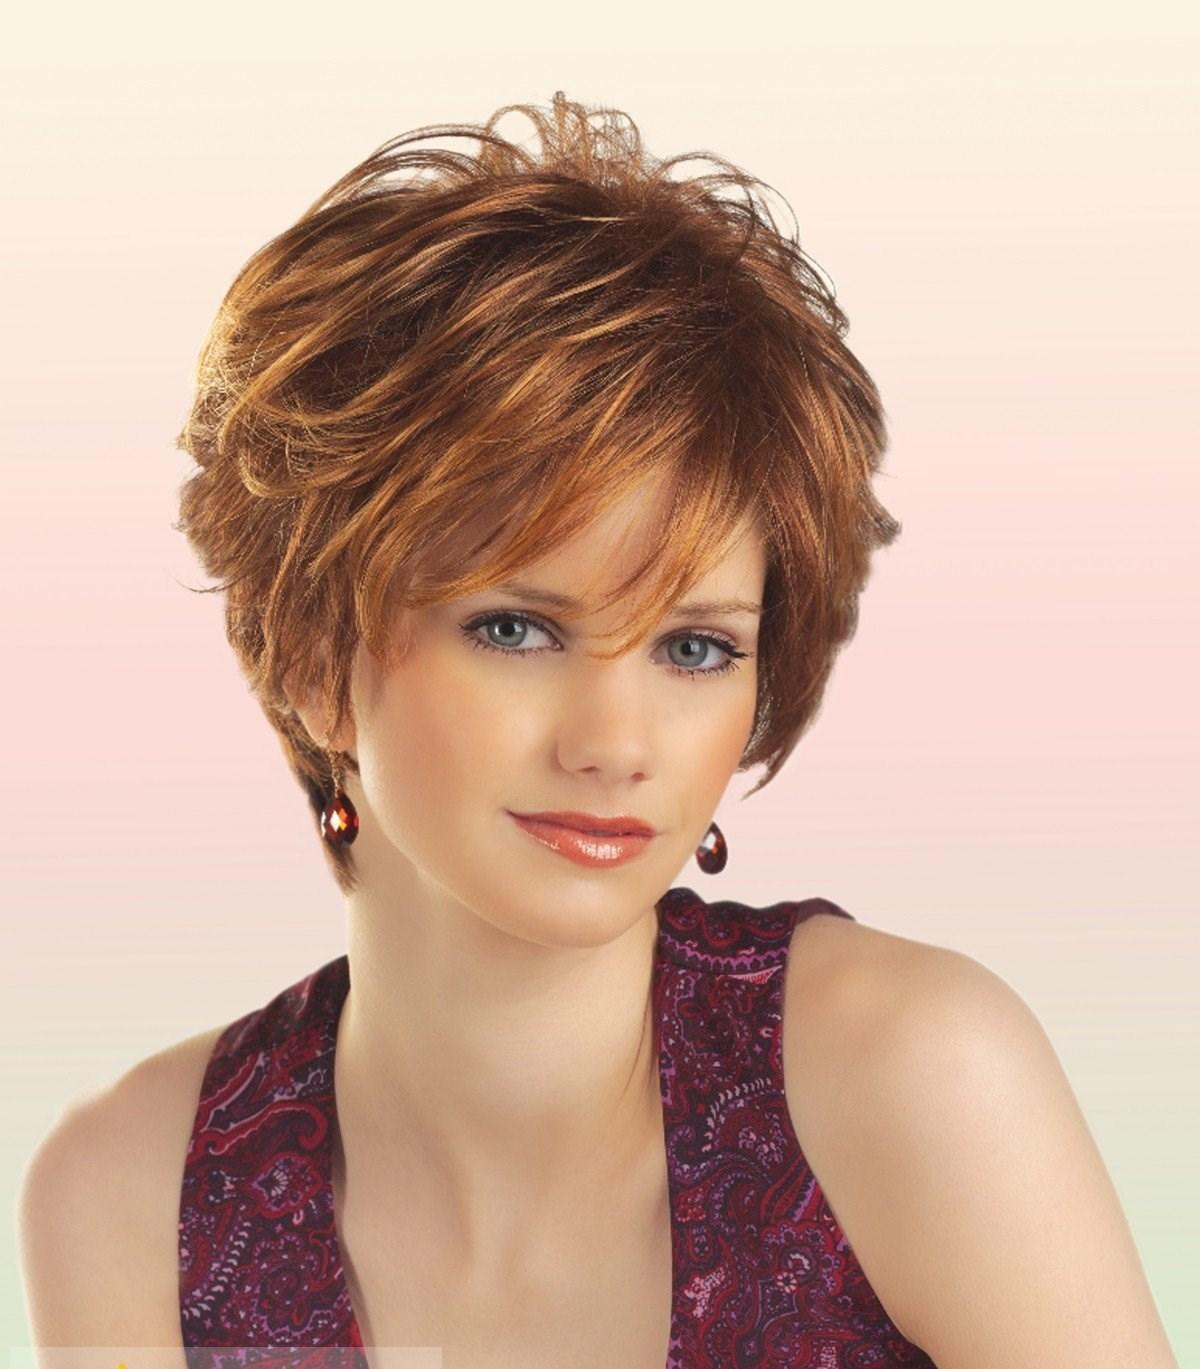 100% Human Hair Perfect Custom Aubrey's Hairstyle Medium Short Straight Lace Wig